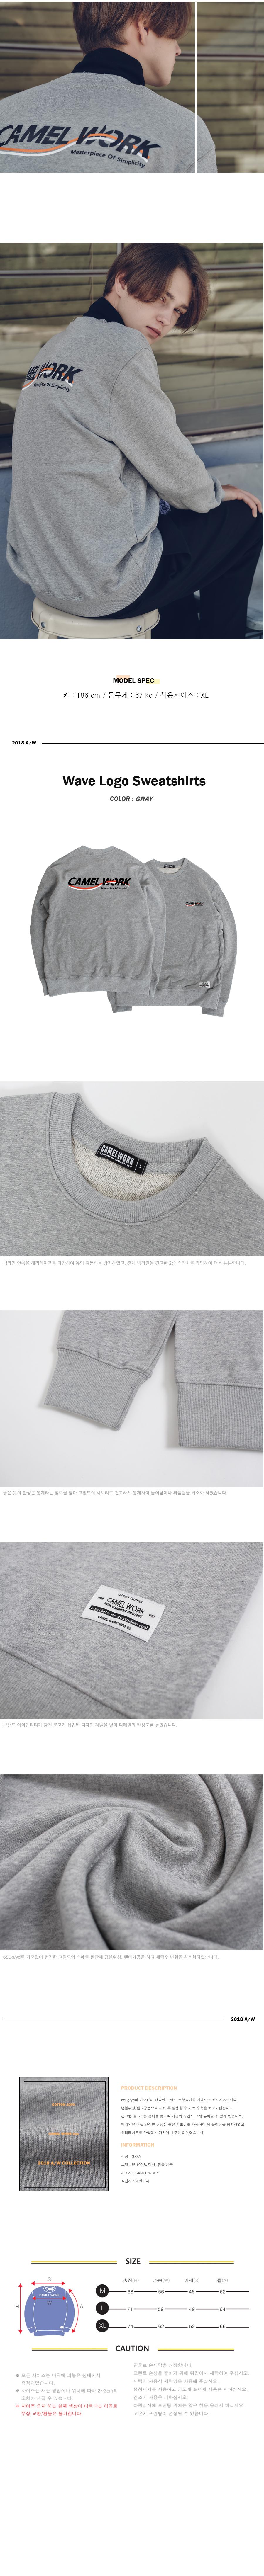 Wave logo sweatshirts g2.jpg